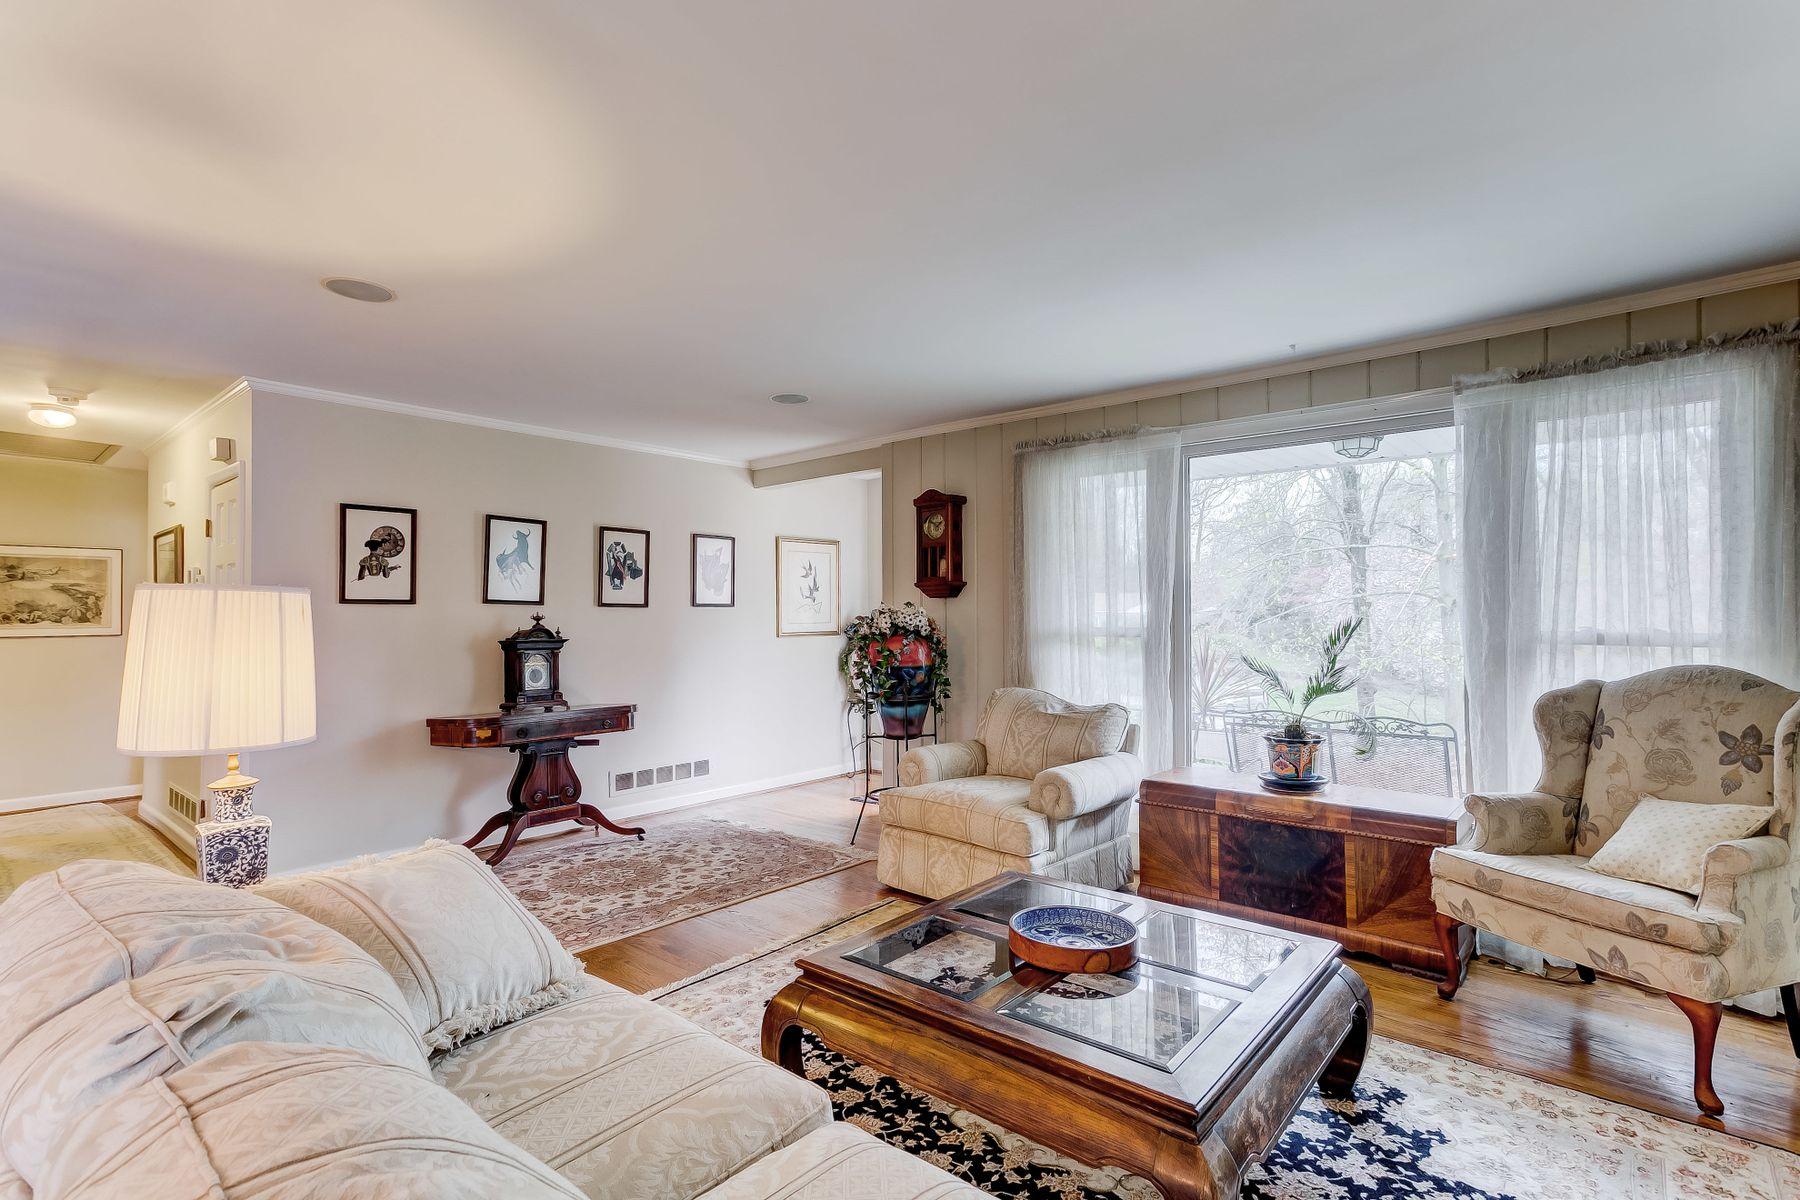 800 Eton Road, Towson, MD 21204 | Hometrack Real Estate Marketing